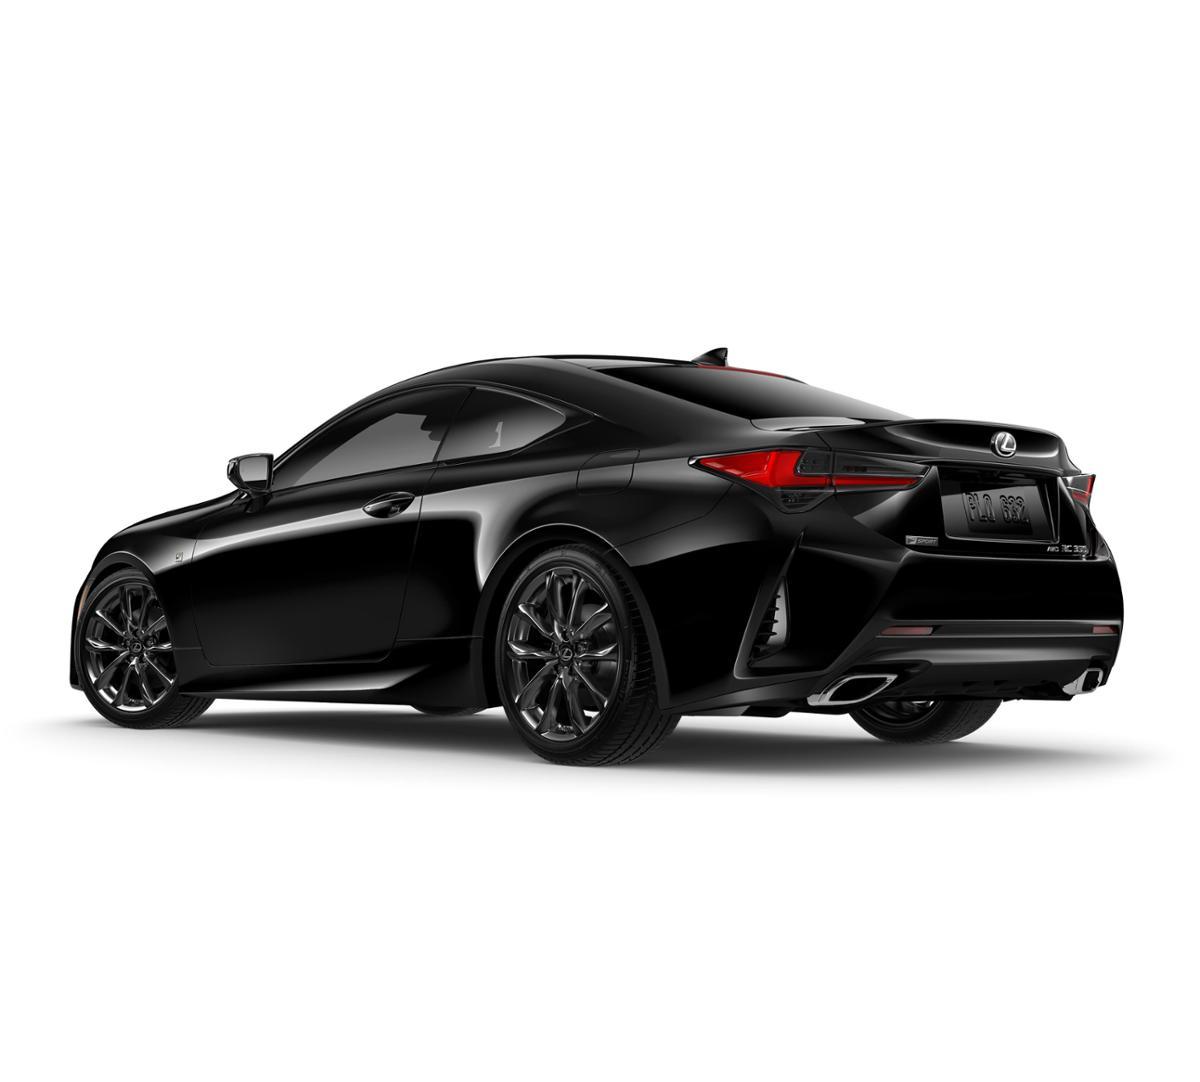 Lexus Rc 350 F Sport Price: 2019 Lexus RC 350 F SPORT For Sale